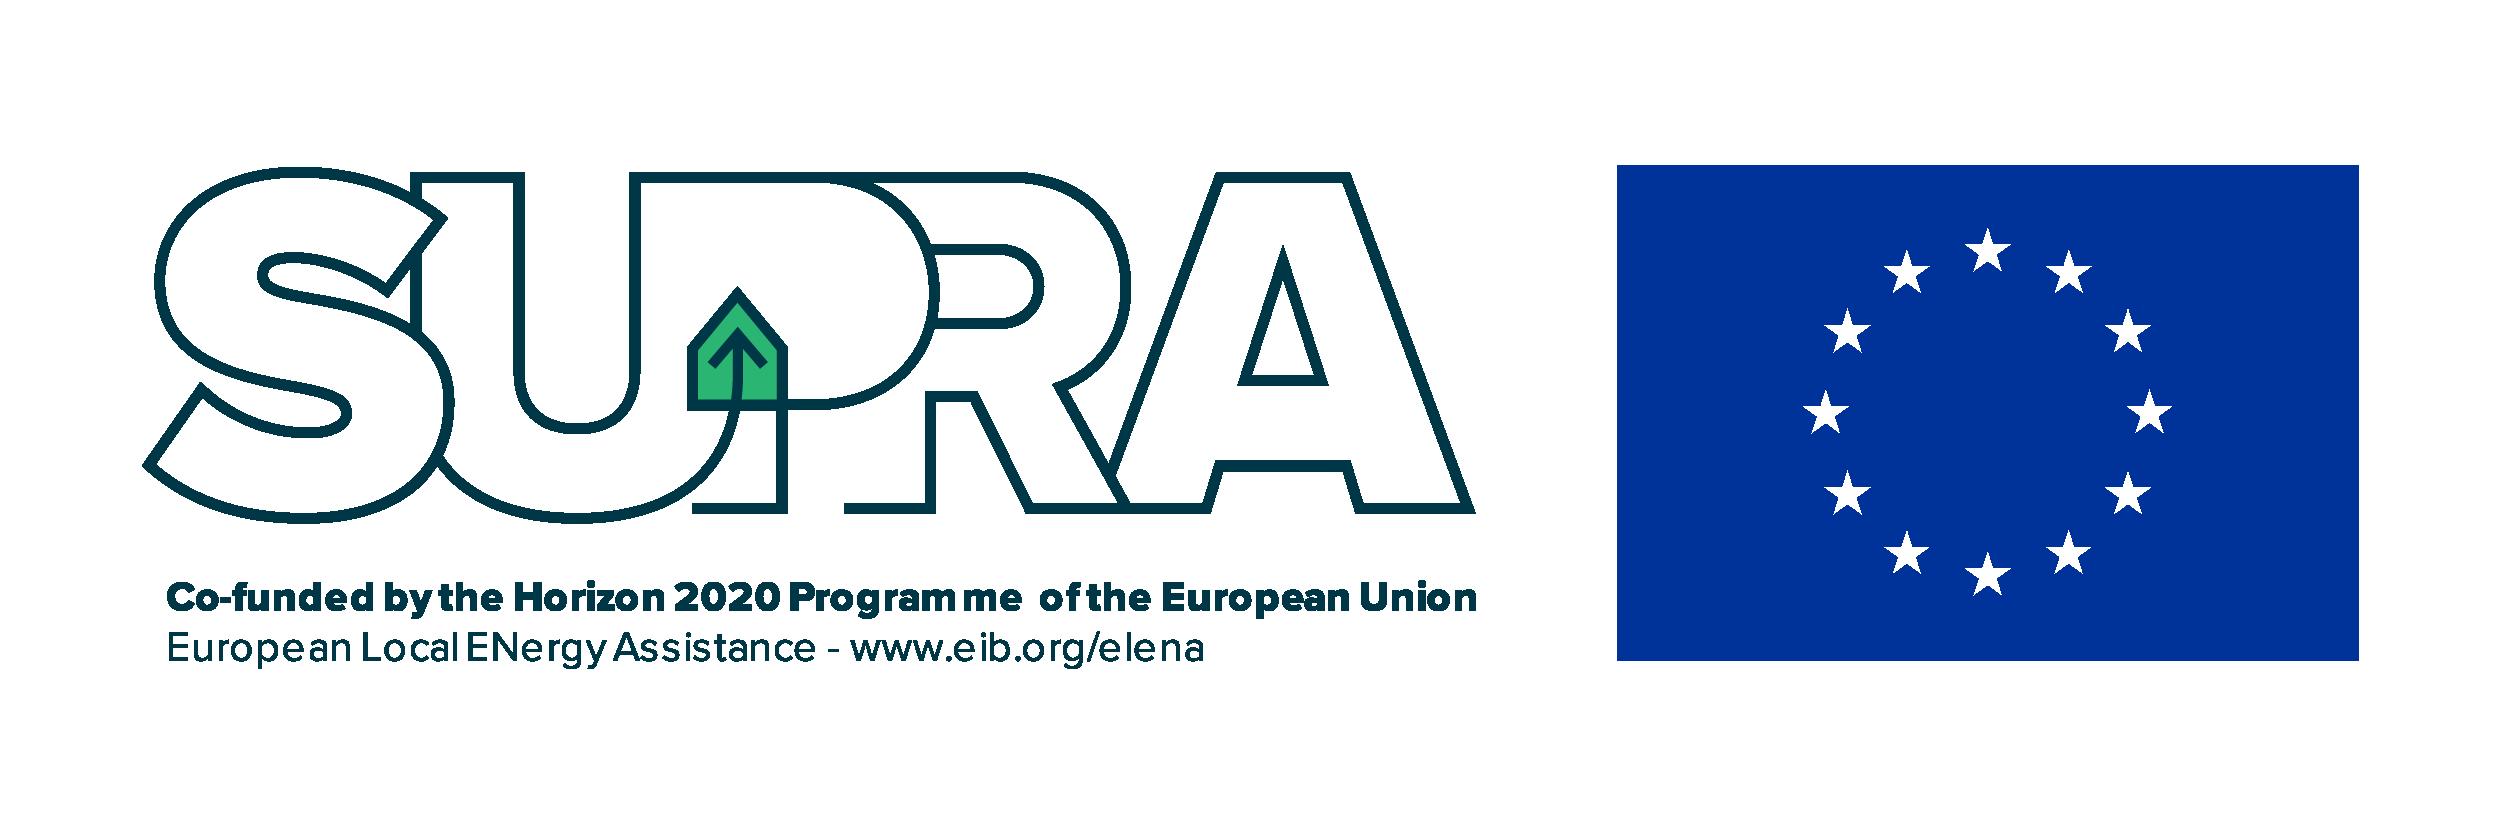 Stekr - SUPRA - renovatiecoach - Europese Unie